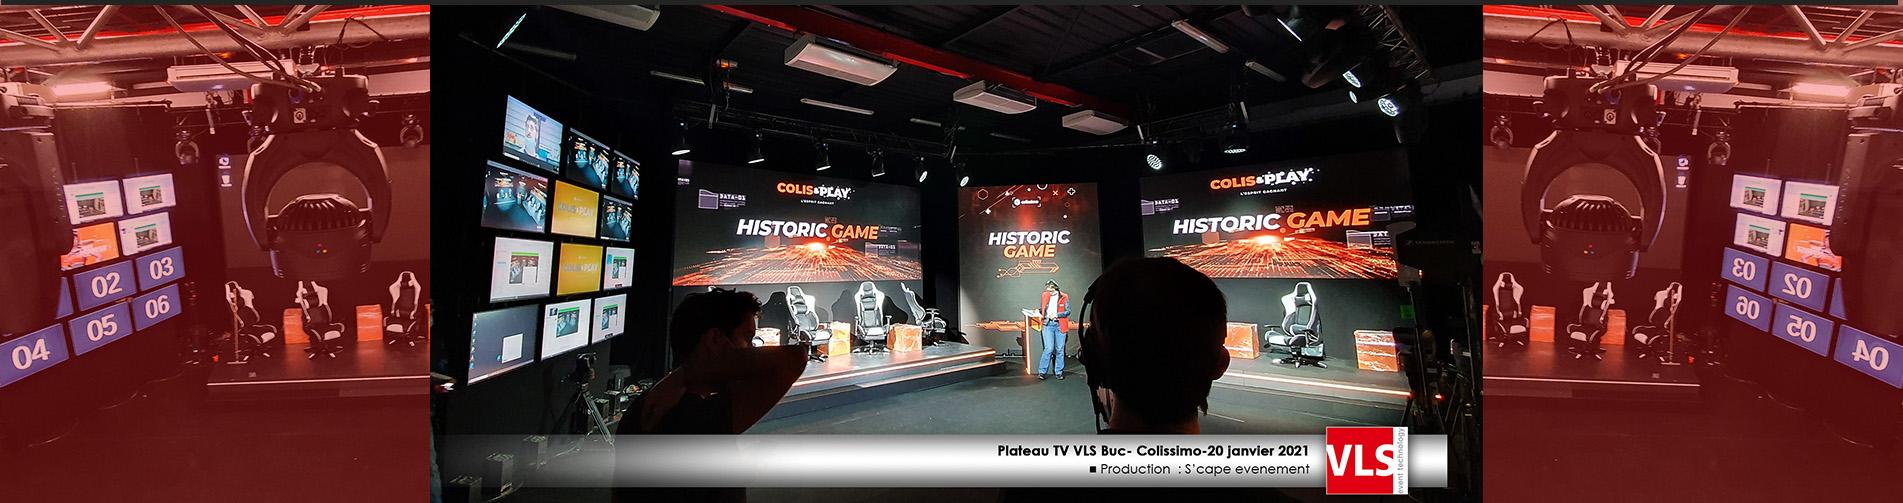 #Studio TV VLS Buc convention Colissimo prod S'cape Evenement